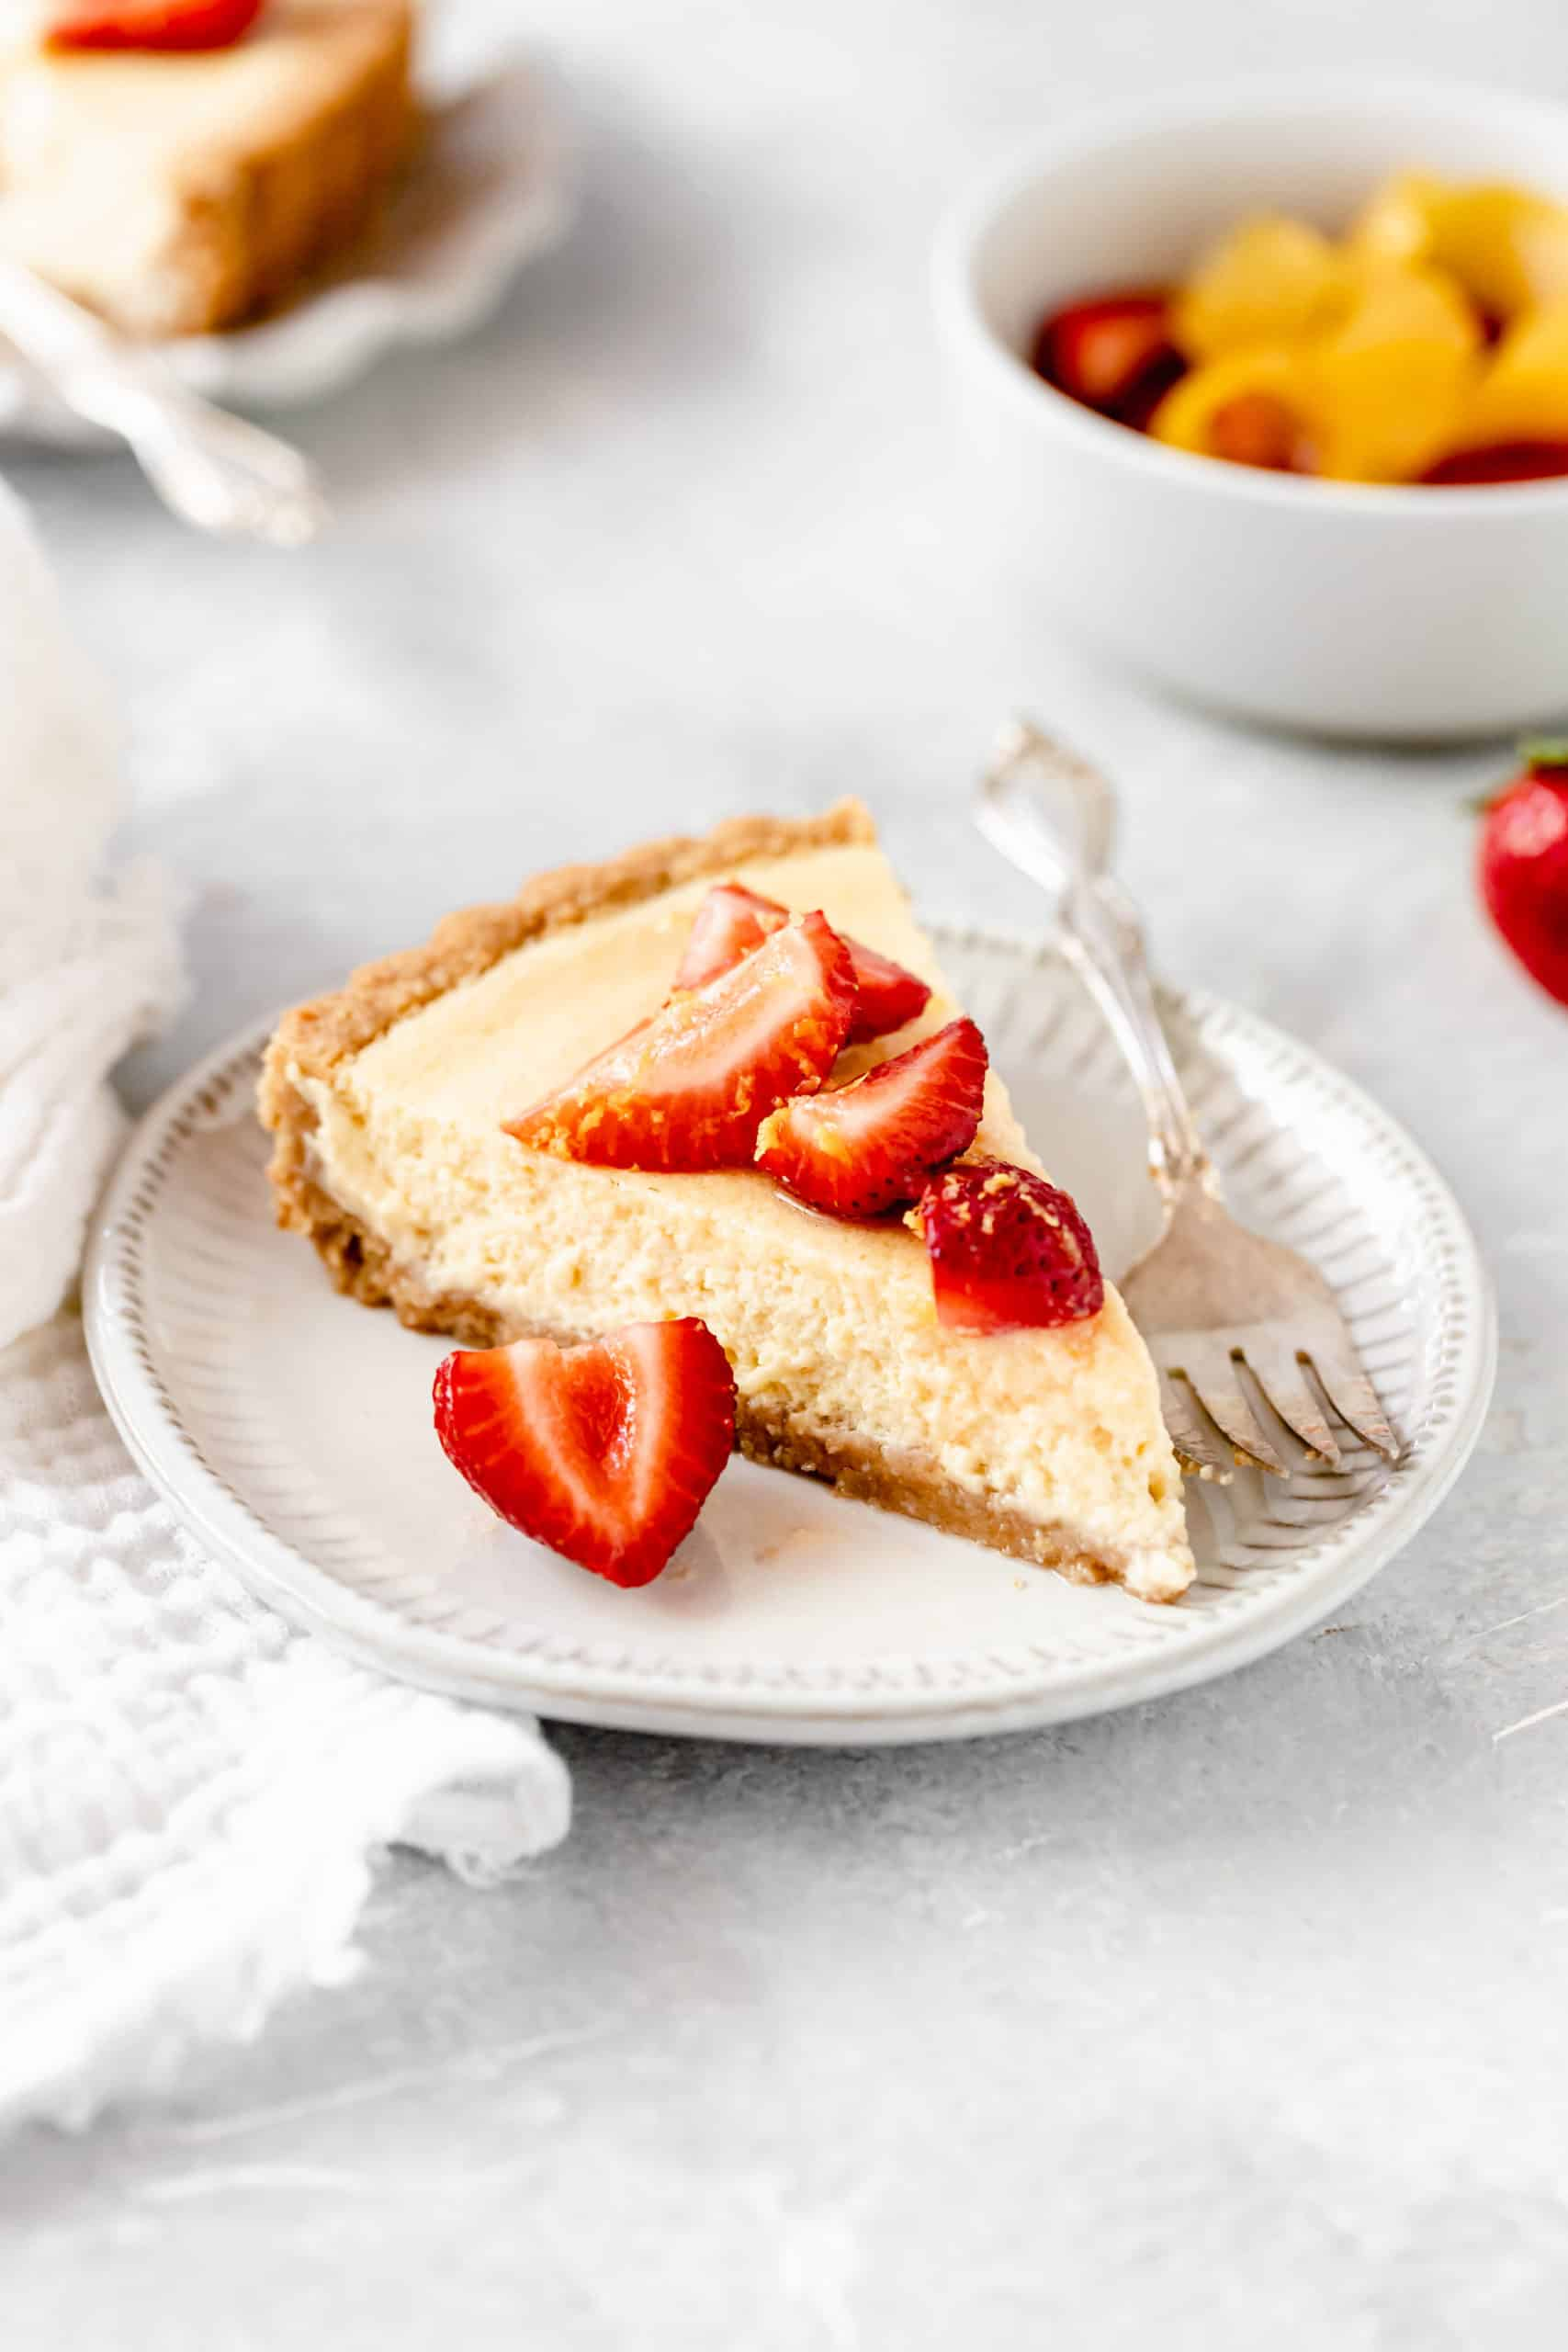 slice of lemon tart with strawberries slices on top